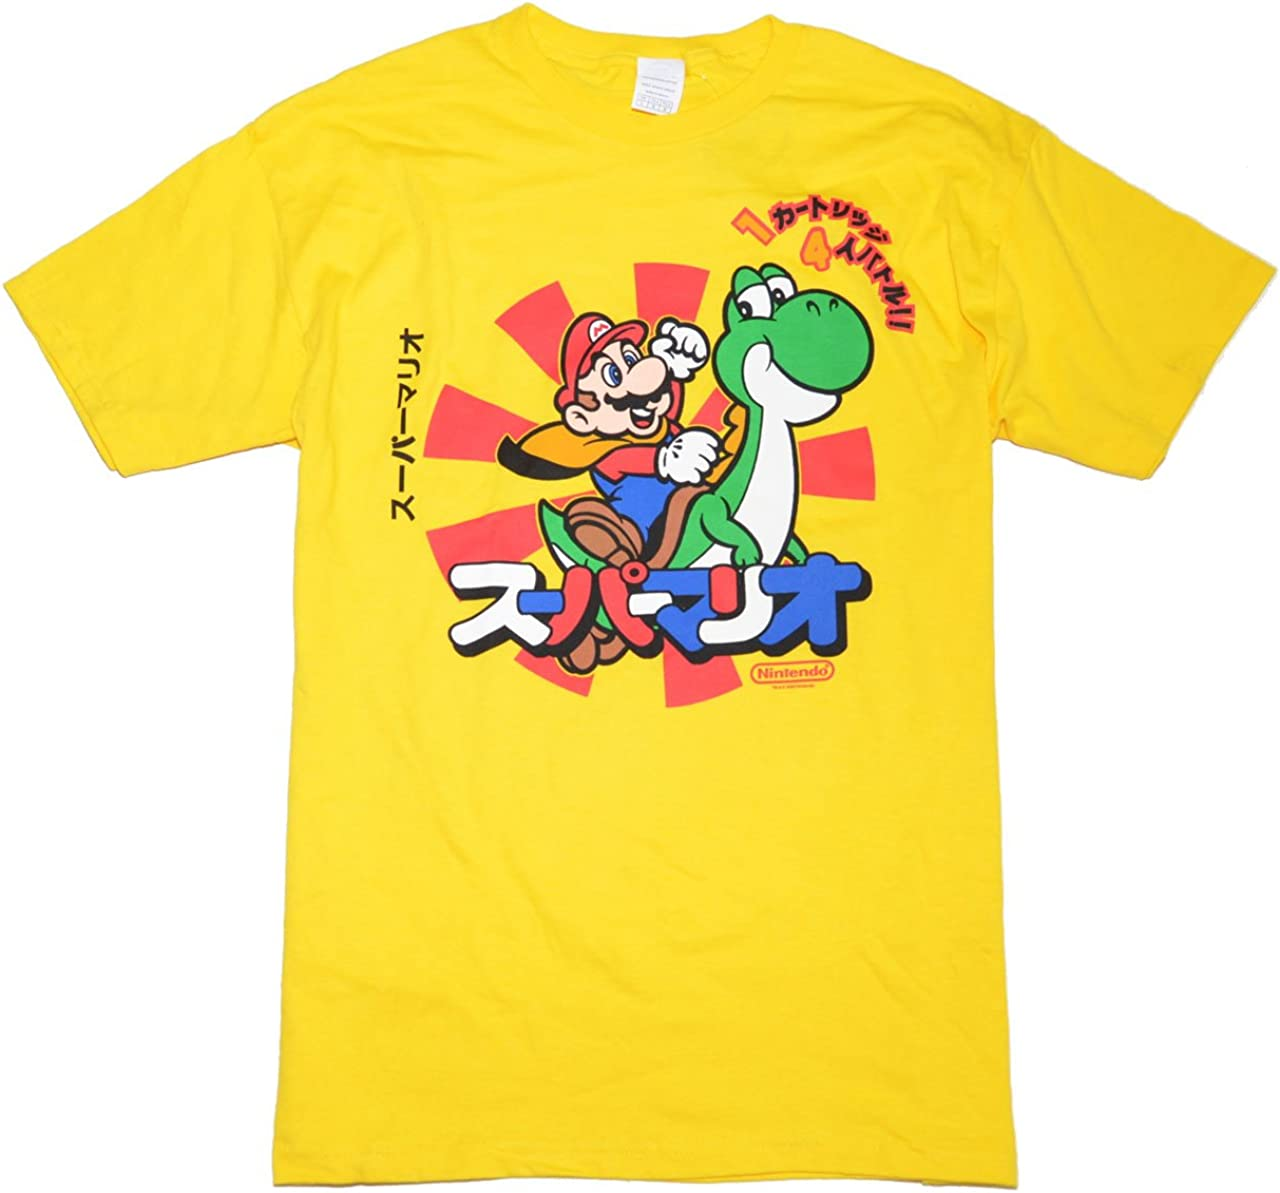 Mario Delta Pro Weight T-Shirt (L 16years, Yellow)